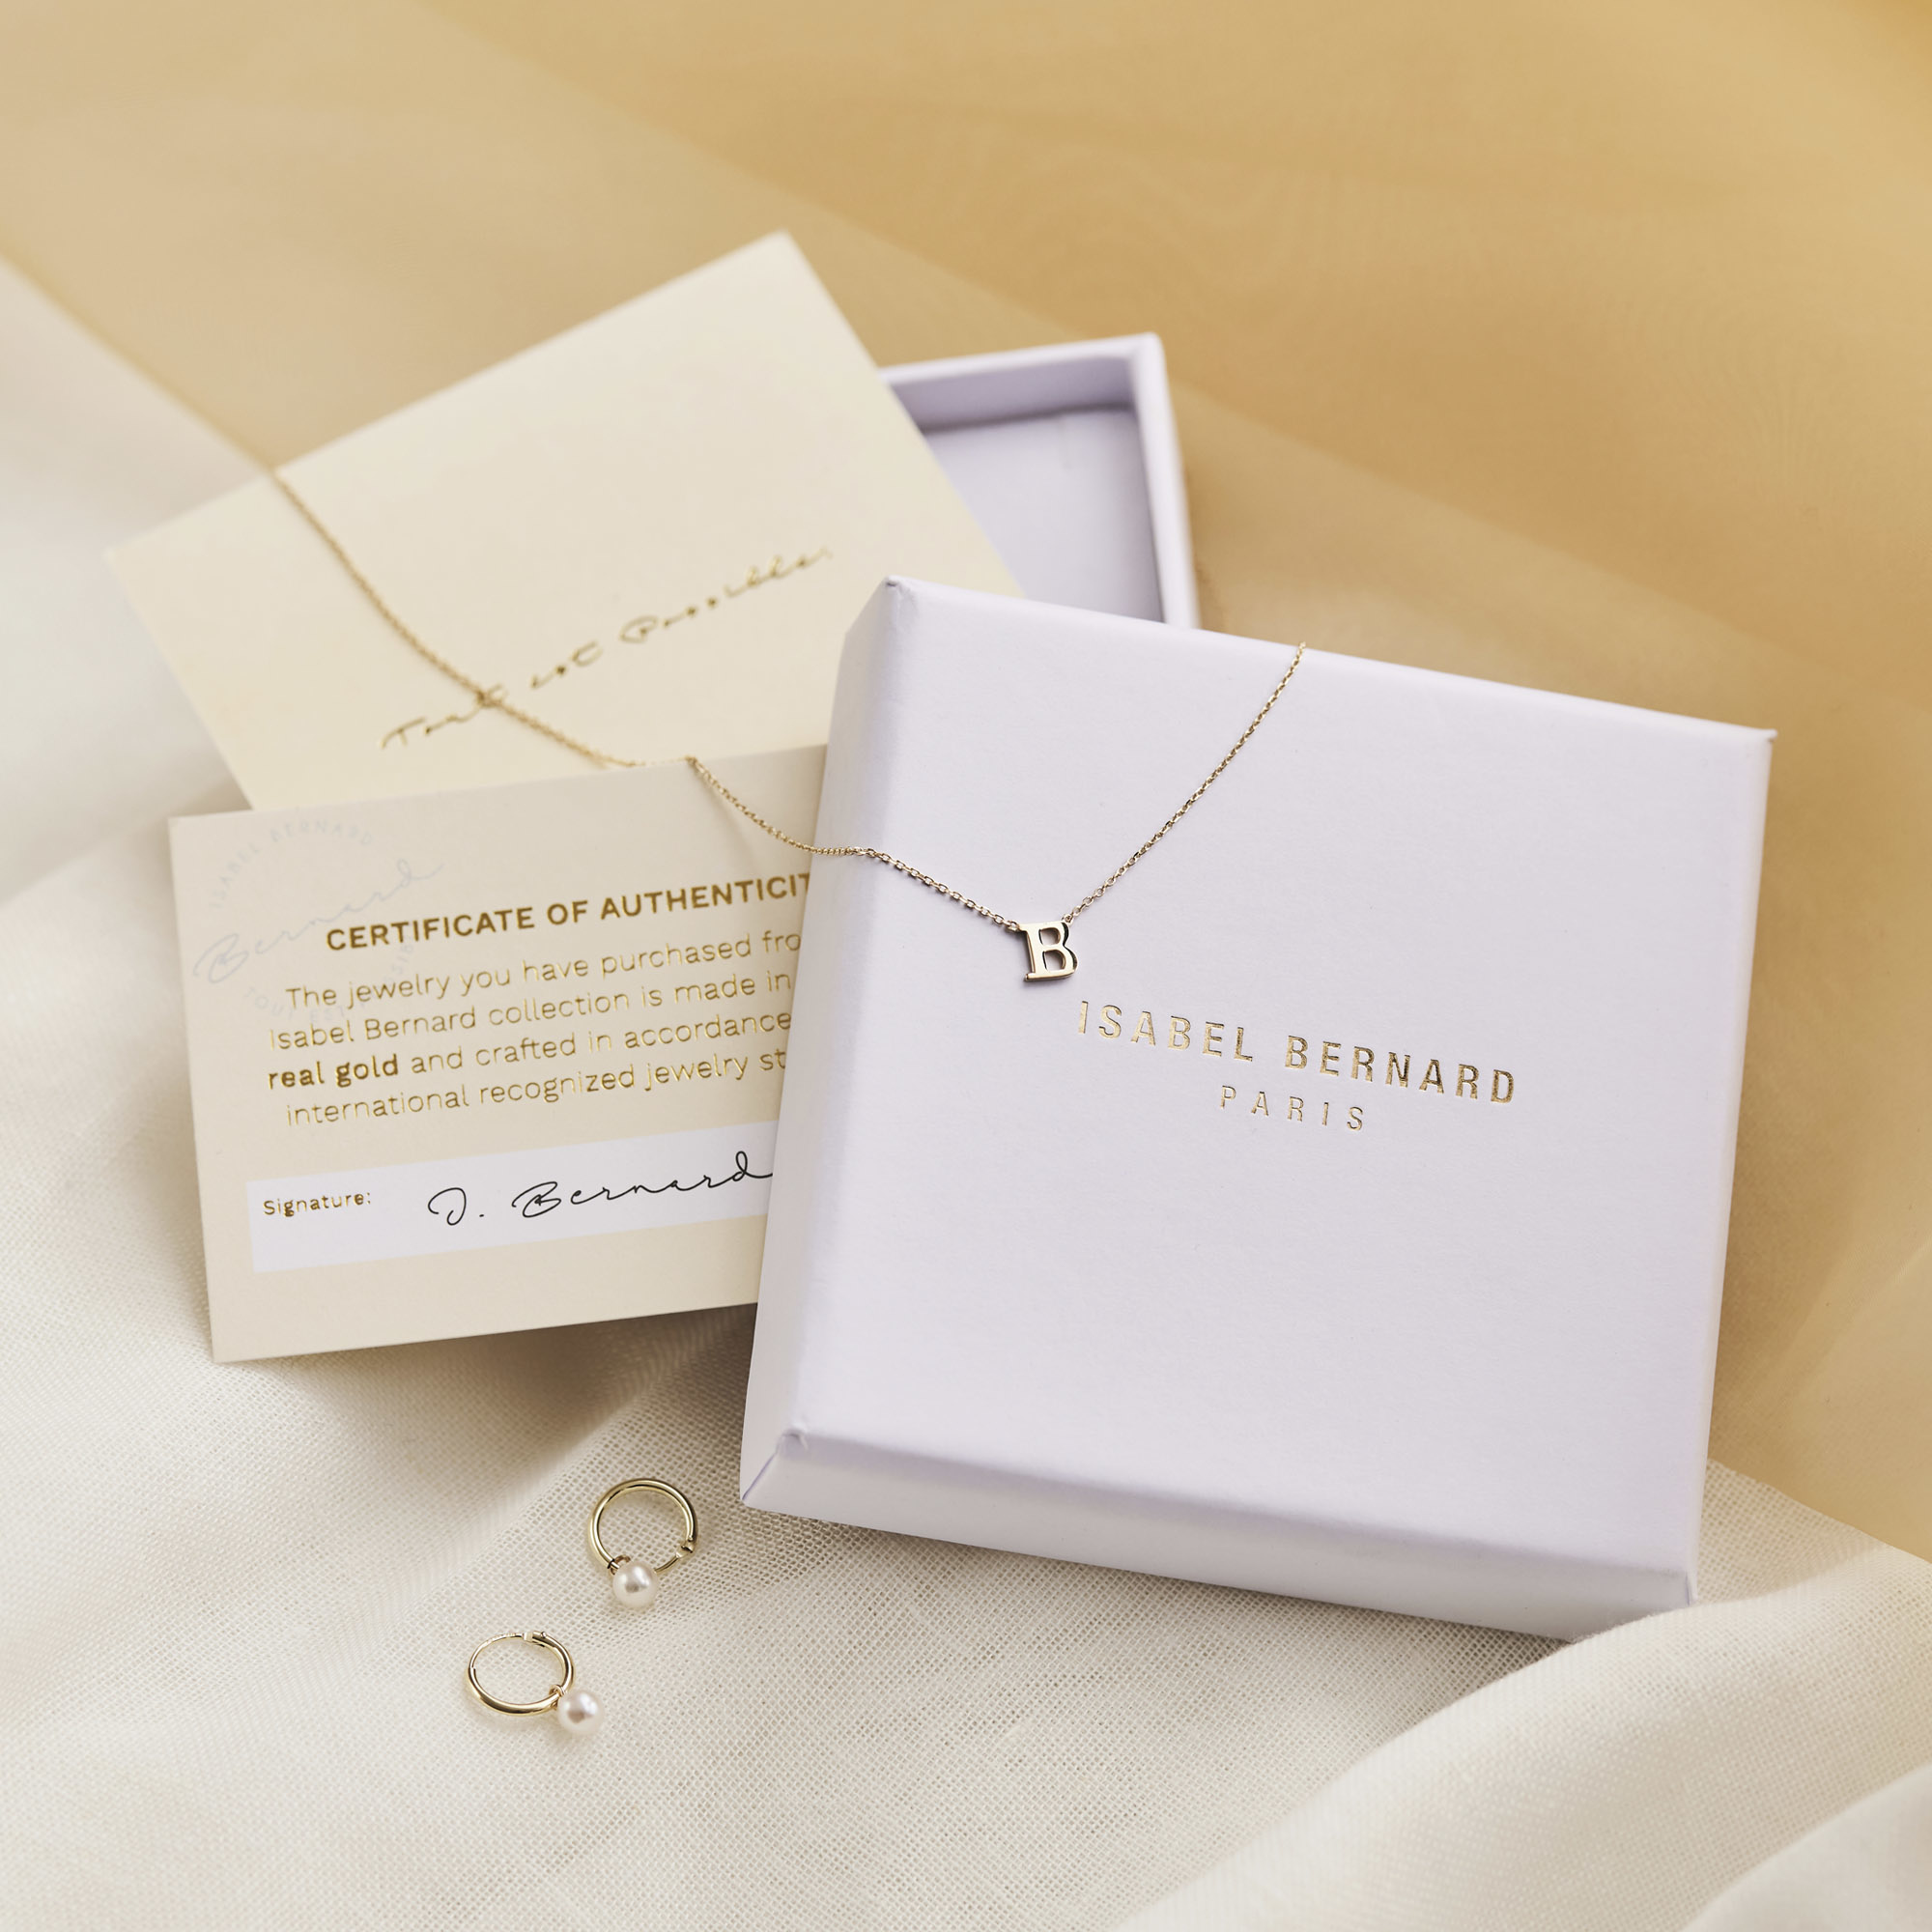 Isabel Bernard Saint Germain Hélione collier en or blanc 14 carats